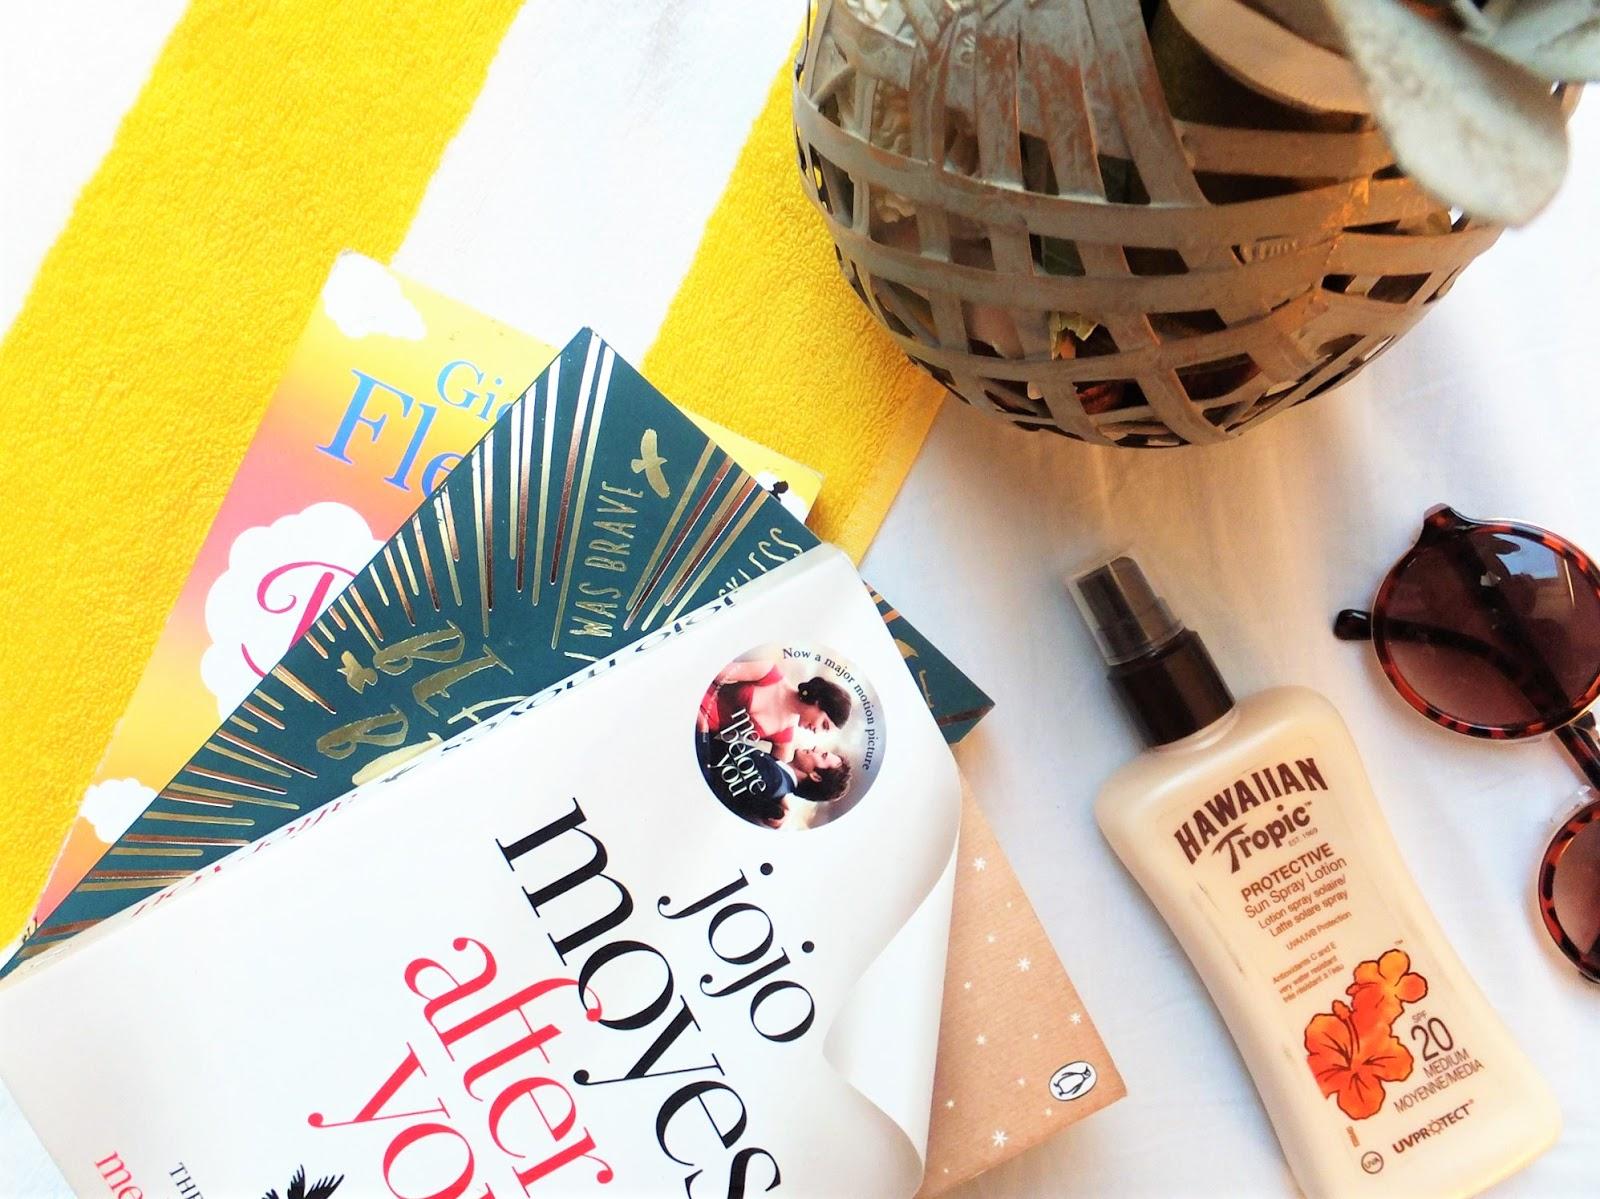 Pineapple-Beach-Towel-Sunglasses-Suncream-Books